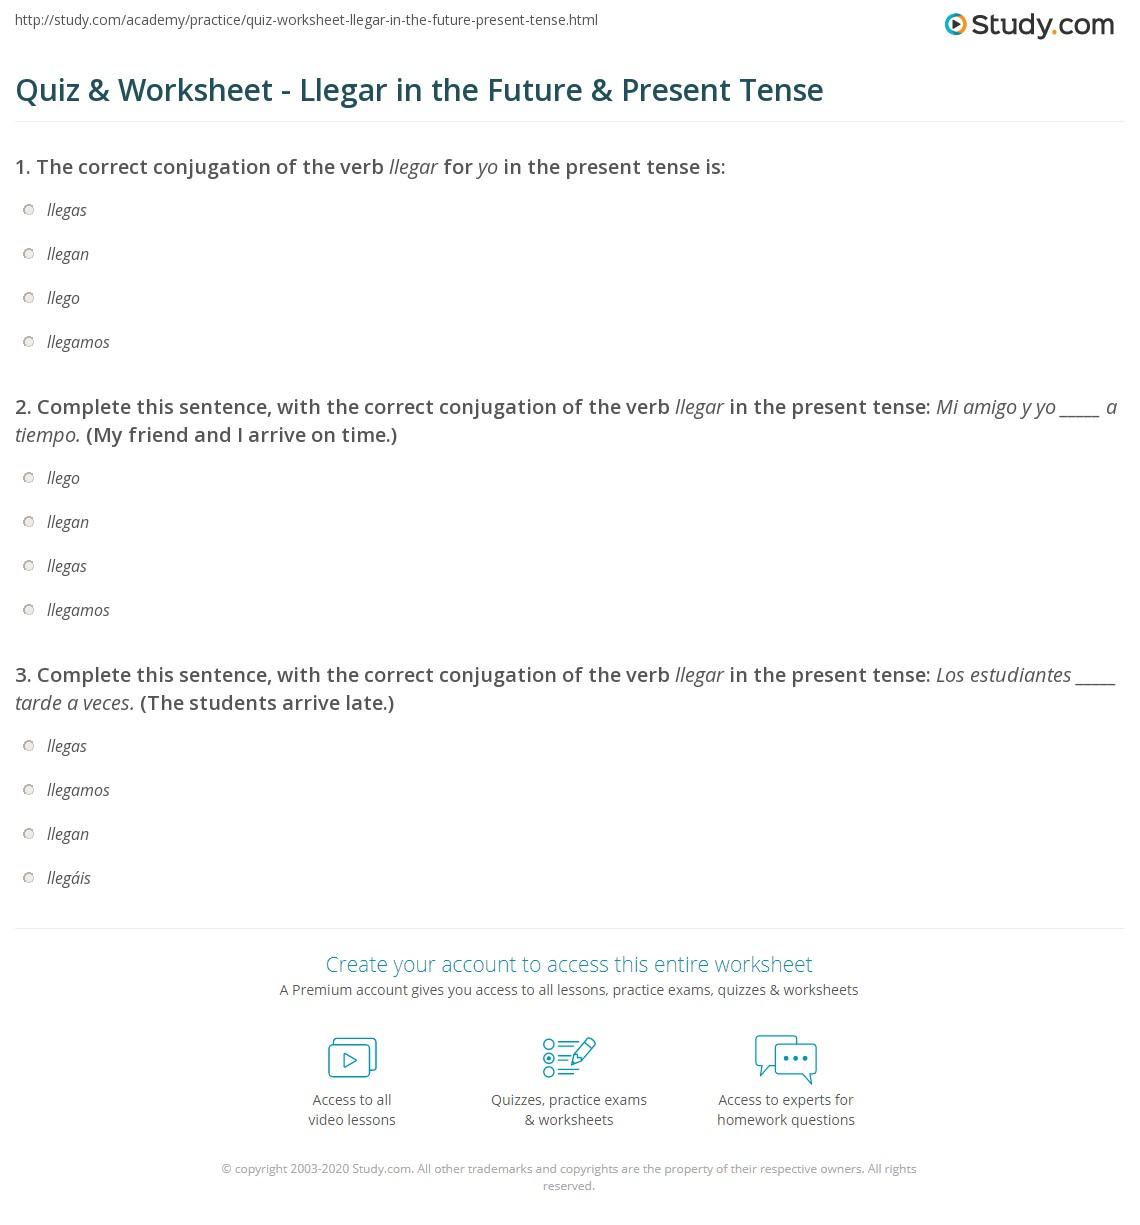 Quiz & Worksheet - Llegar in the Future & Present Tense | Study.com